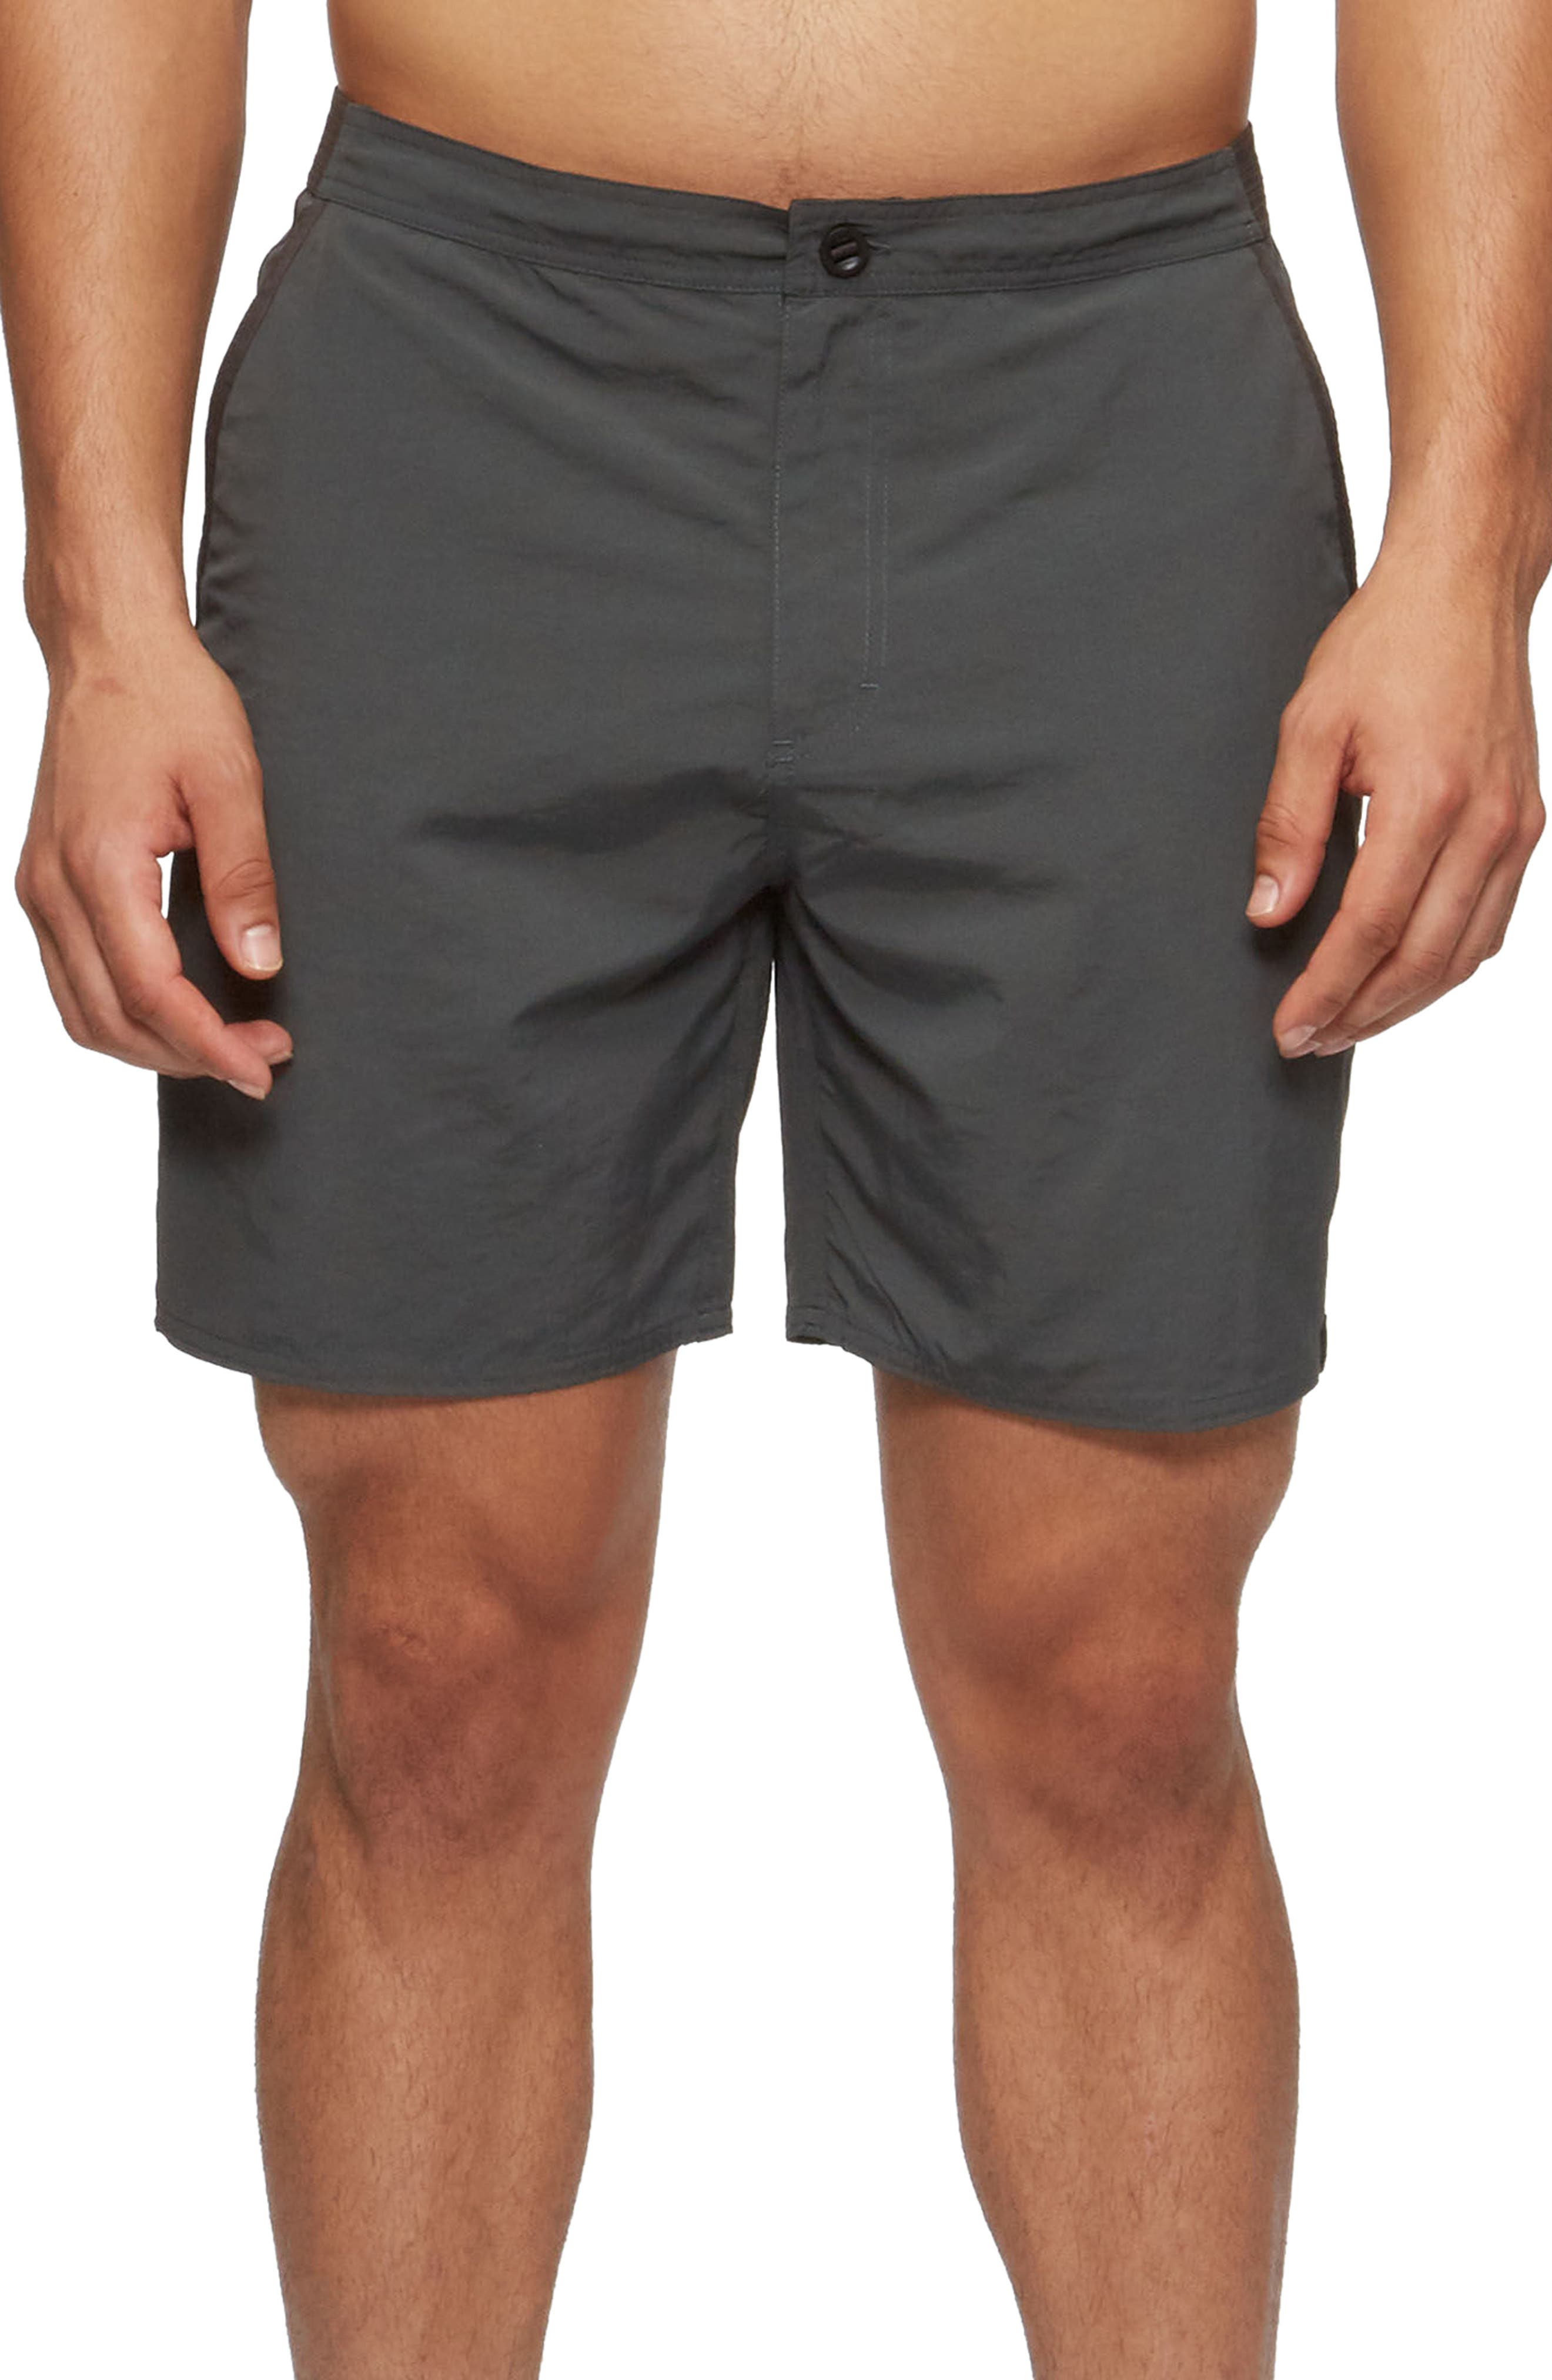 Catera Swim Shorts,                             Main thumbnail 1, color,                             COAL CAMO